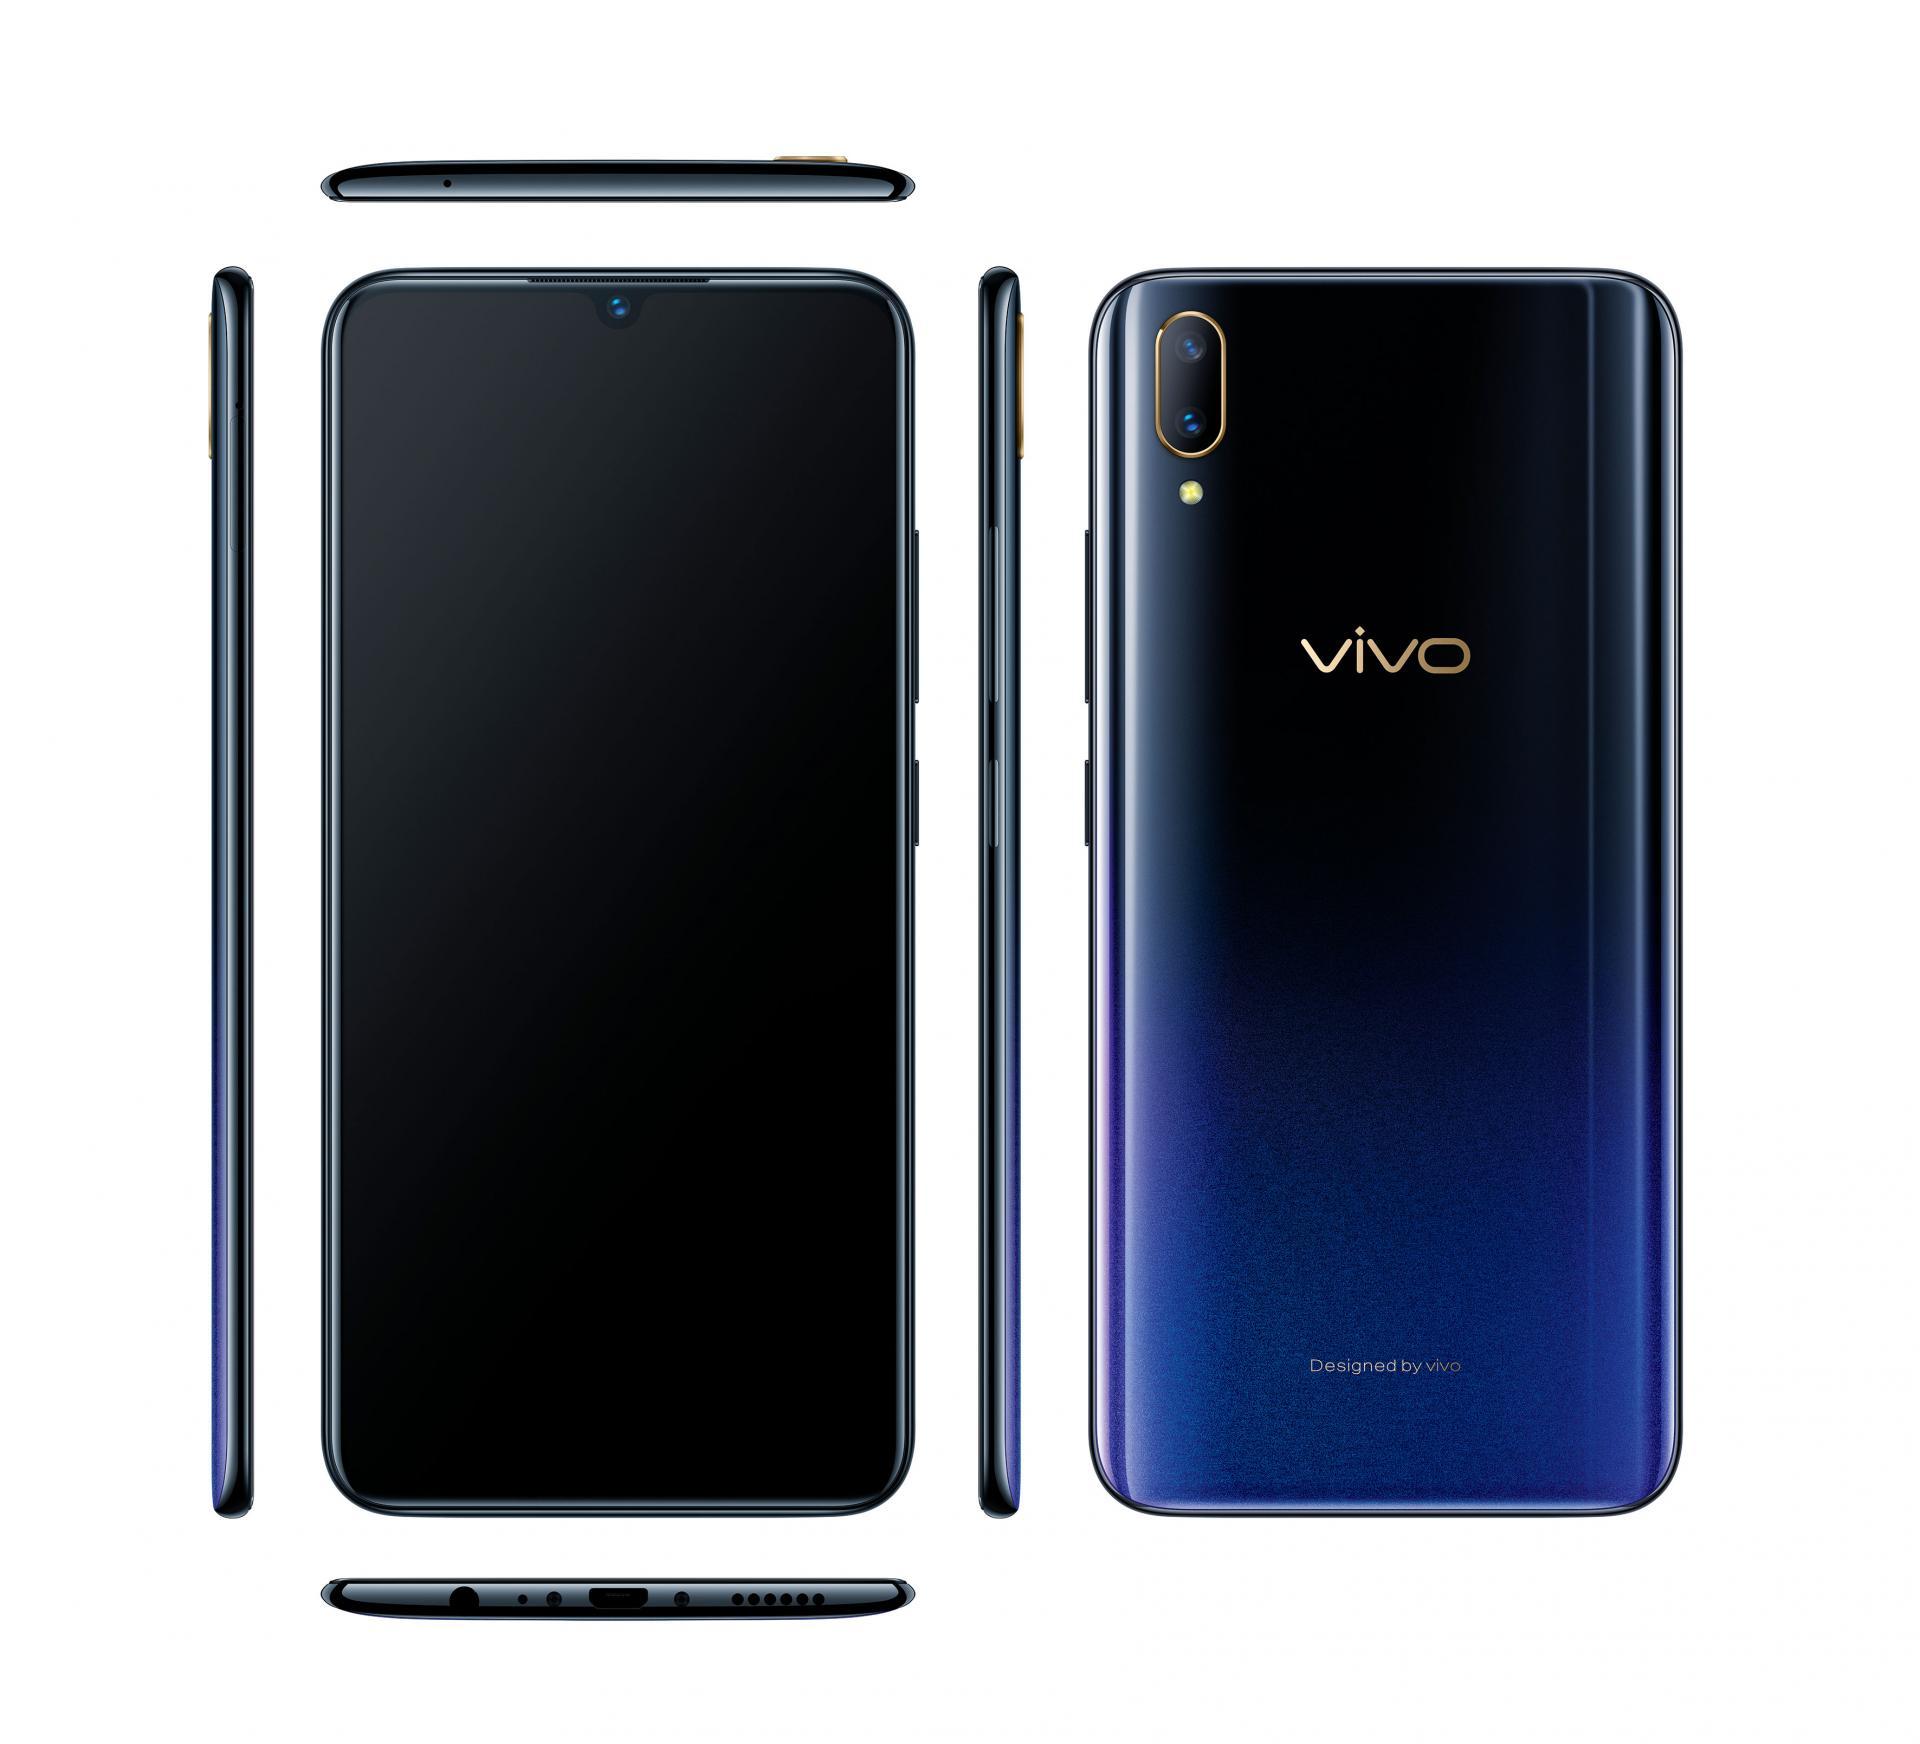 Vivo хвалит камеру иподэкранный сканер отпечатков свежего смартфонаV11